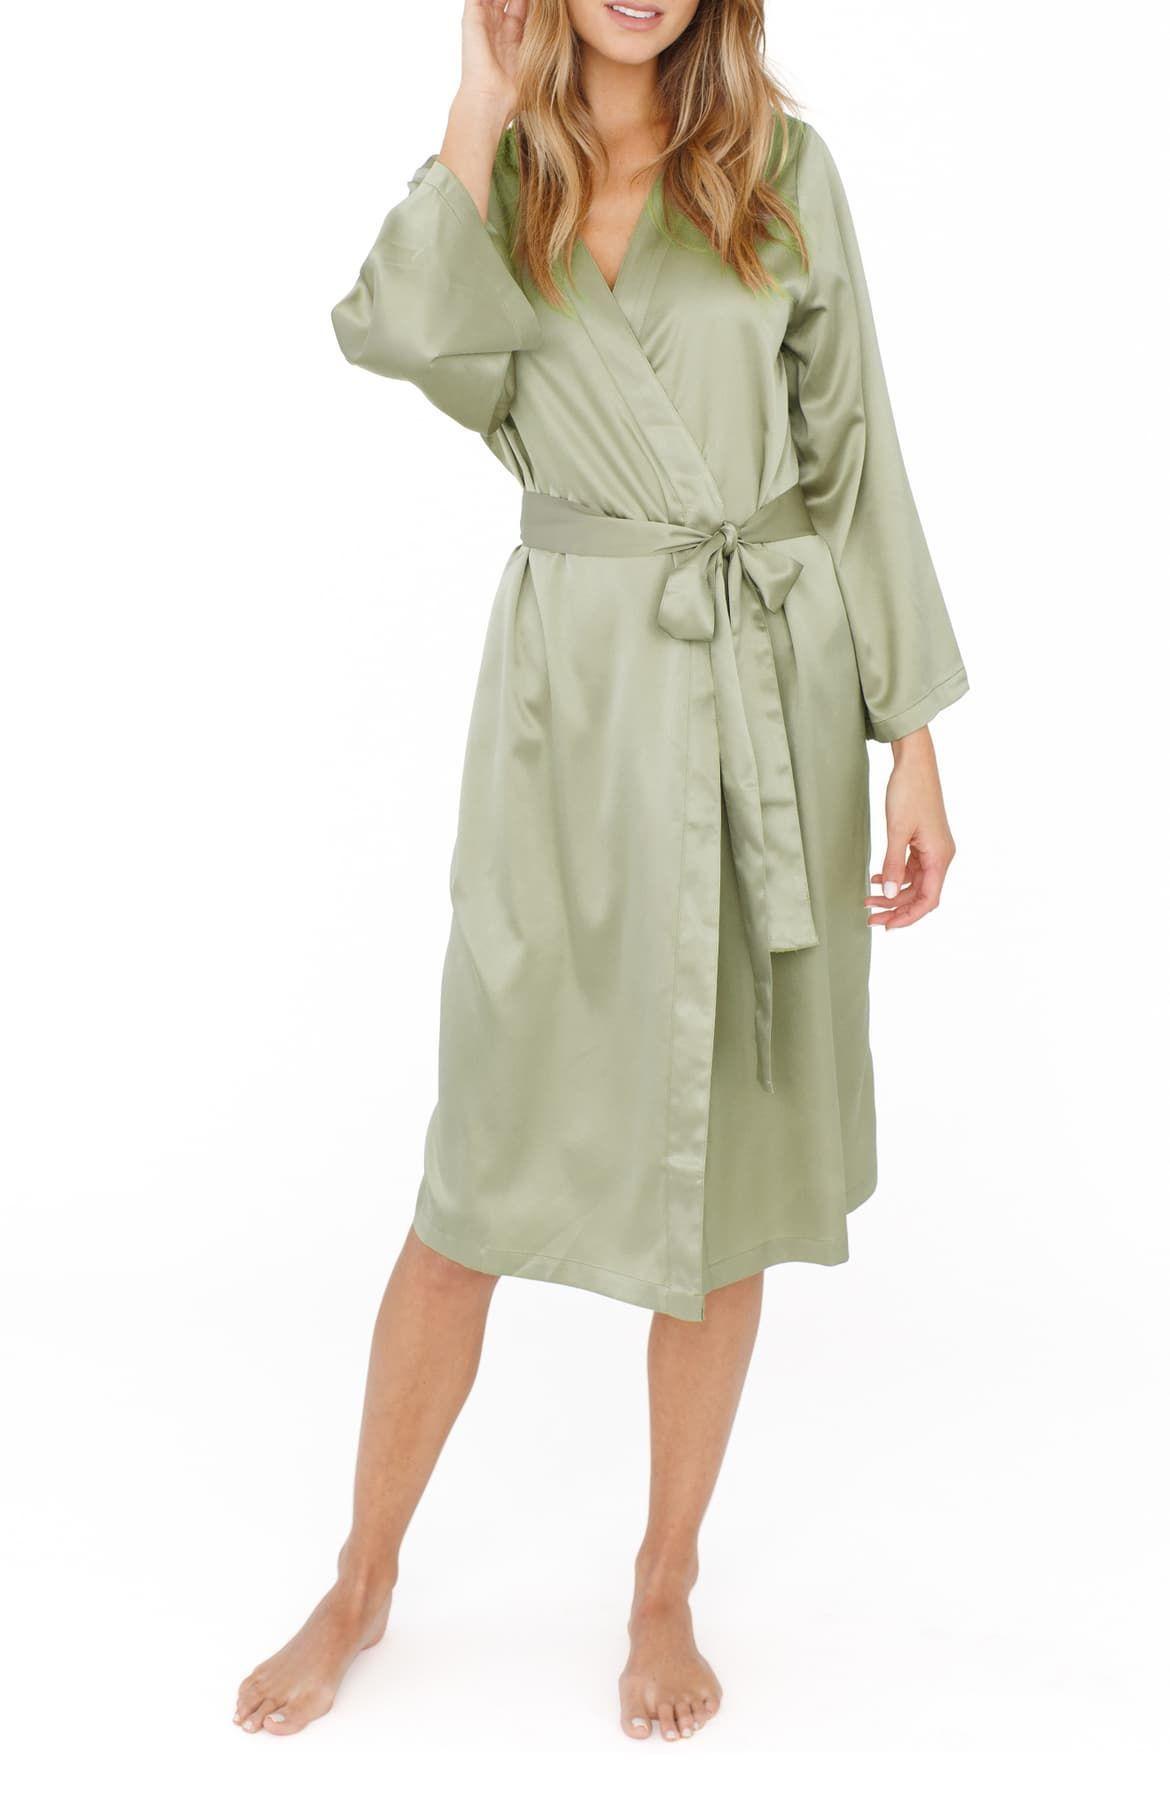 Bathrobes For Women 2020 Best Bath Robes